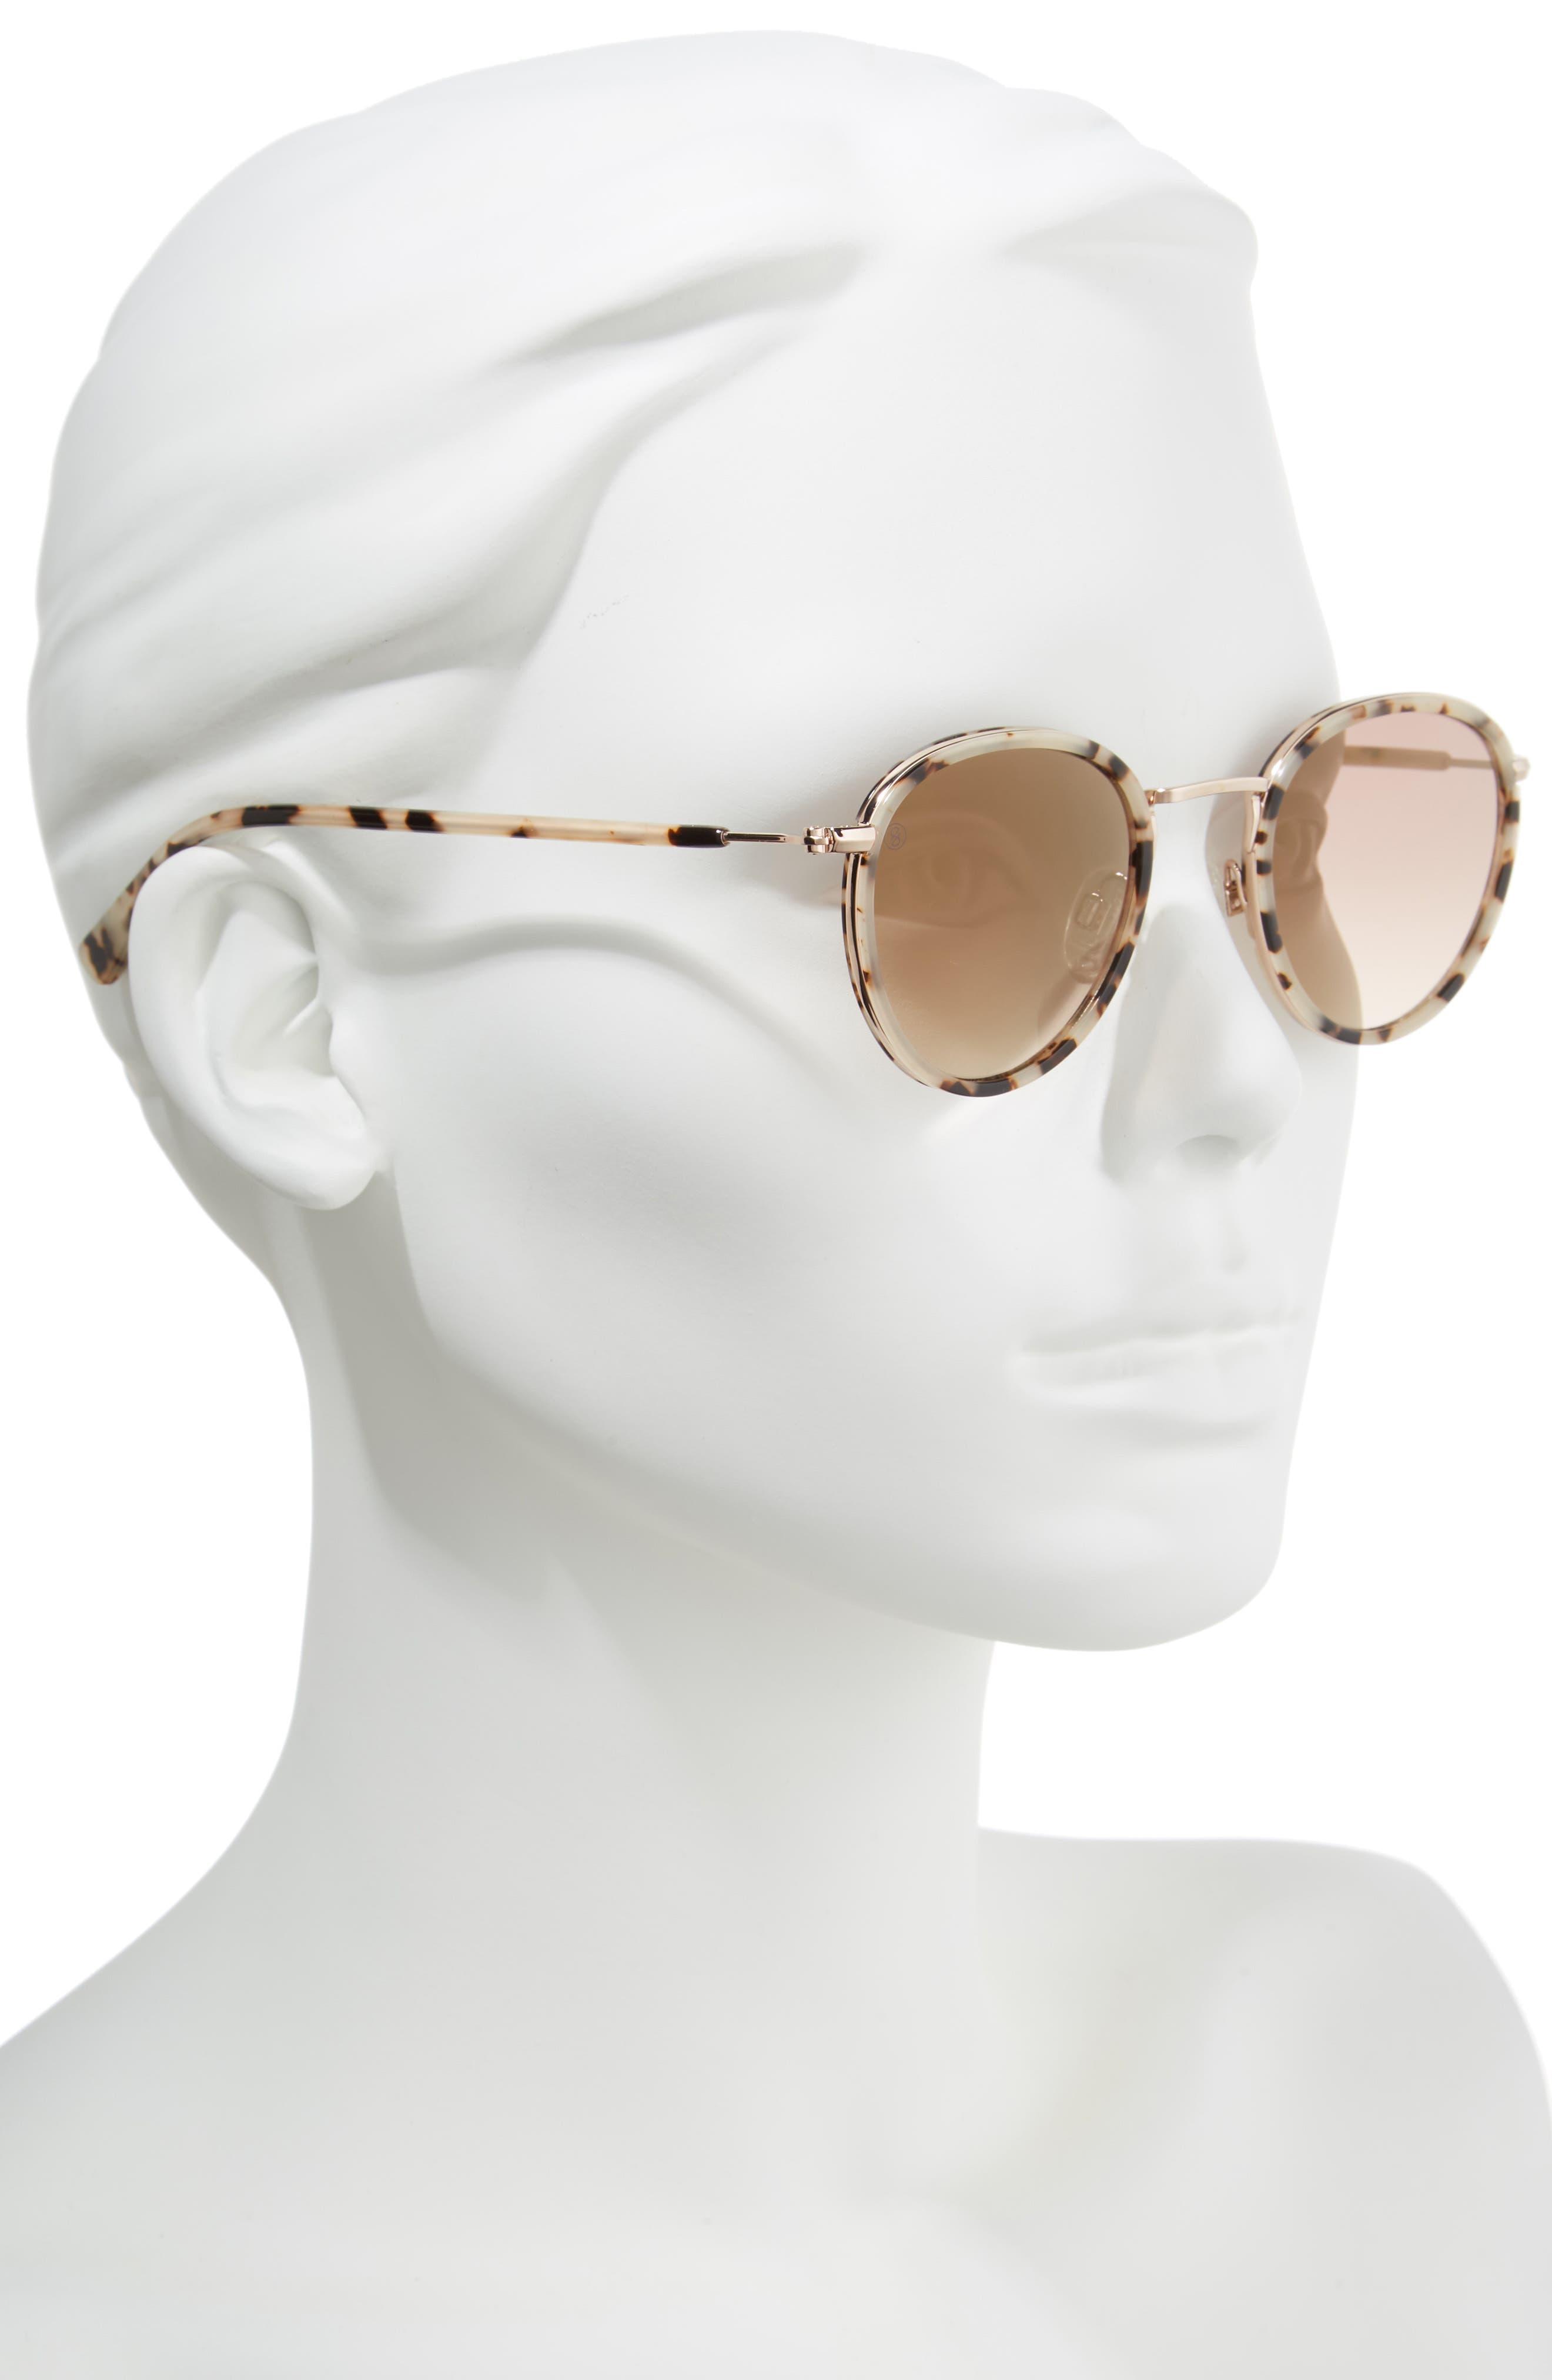 D'BLANC Prologue 48mm Round Sunglasses,                             Alternate thumbnail 2, color,                             200